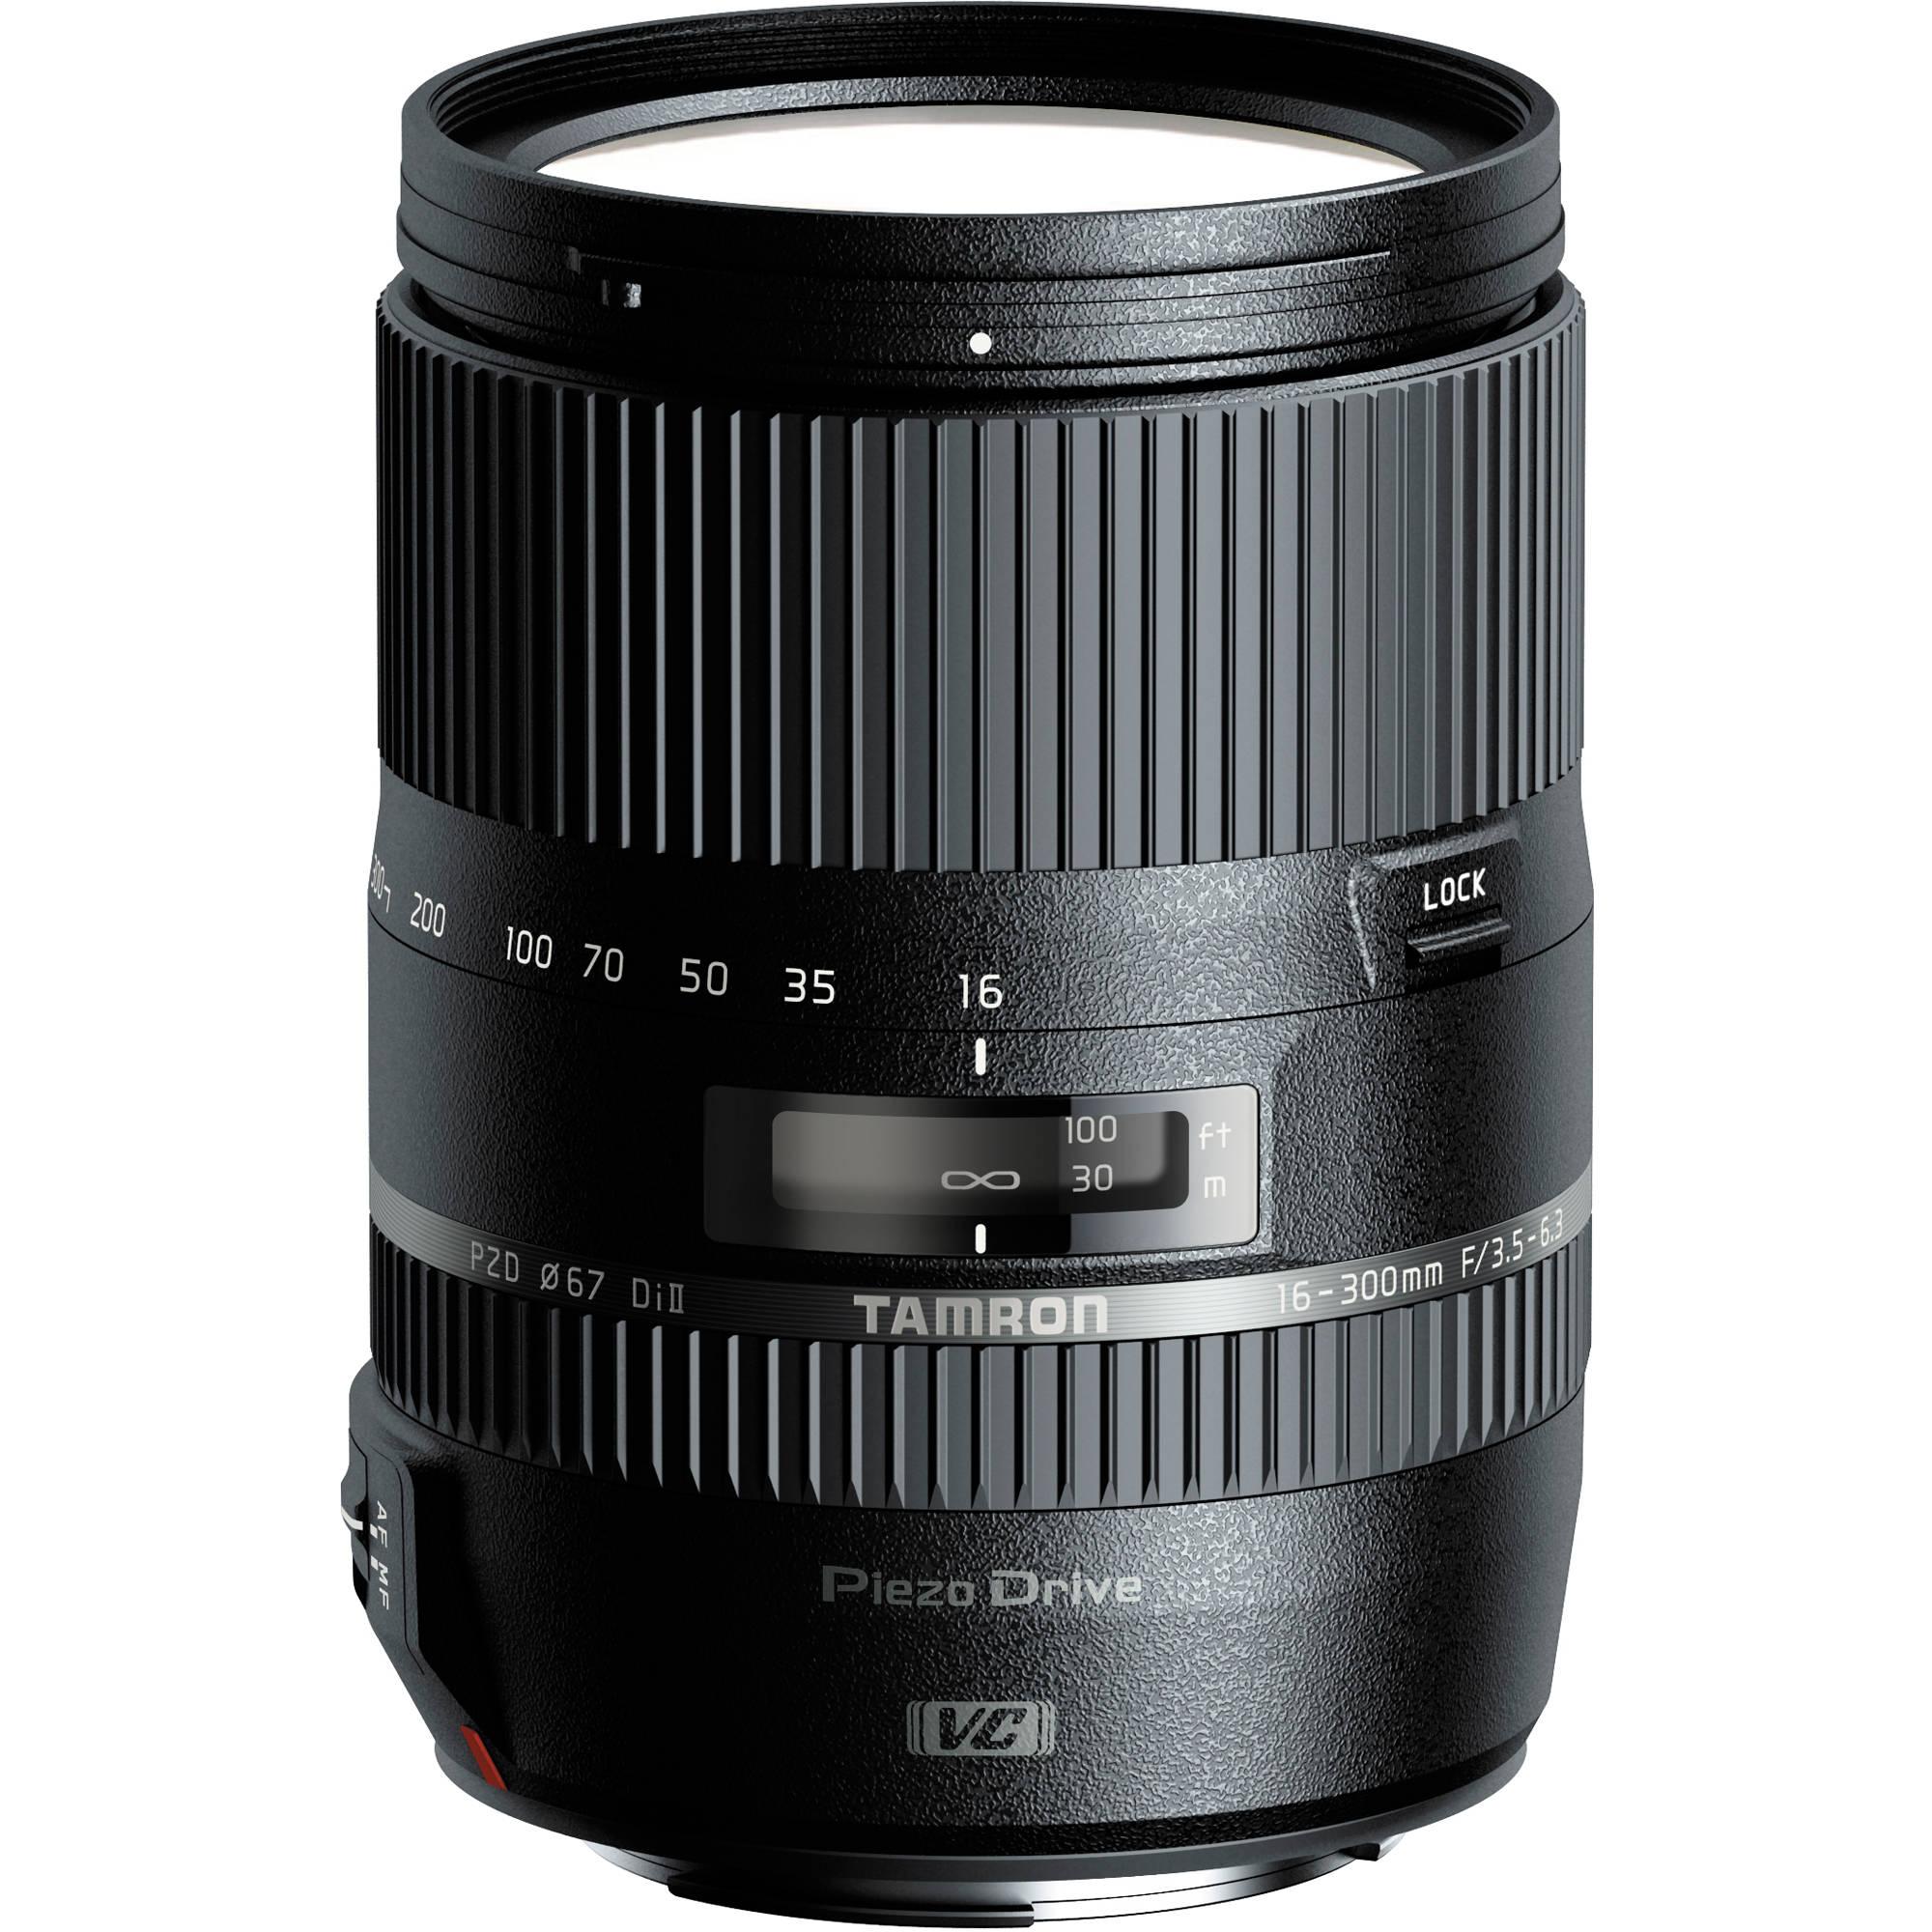 tamron 16 300mm f 3 5 6 3 di ii vc pzd macro lens afb016n 7001. Black Bedroom Furniture Sets. Home Design Ideas